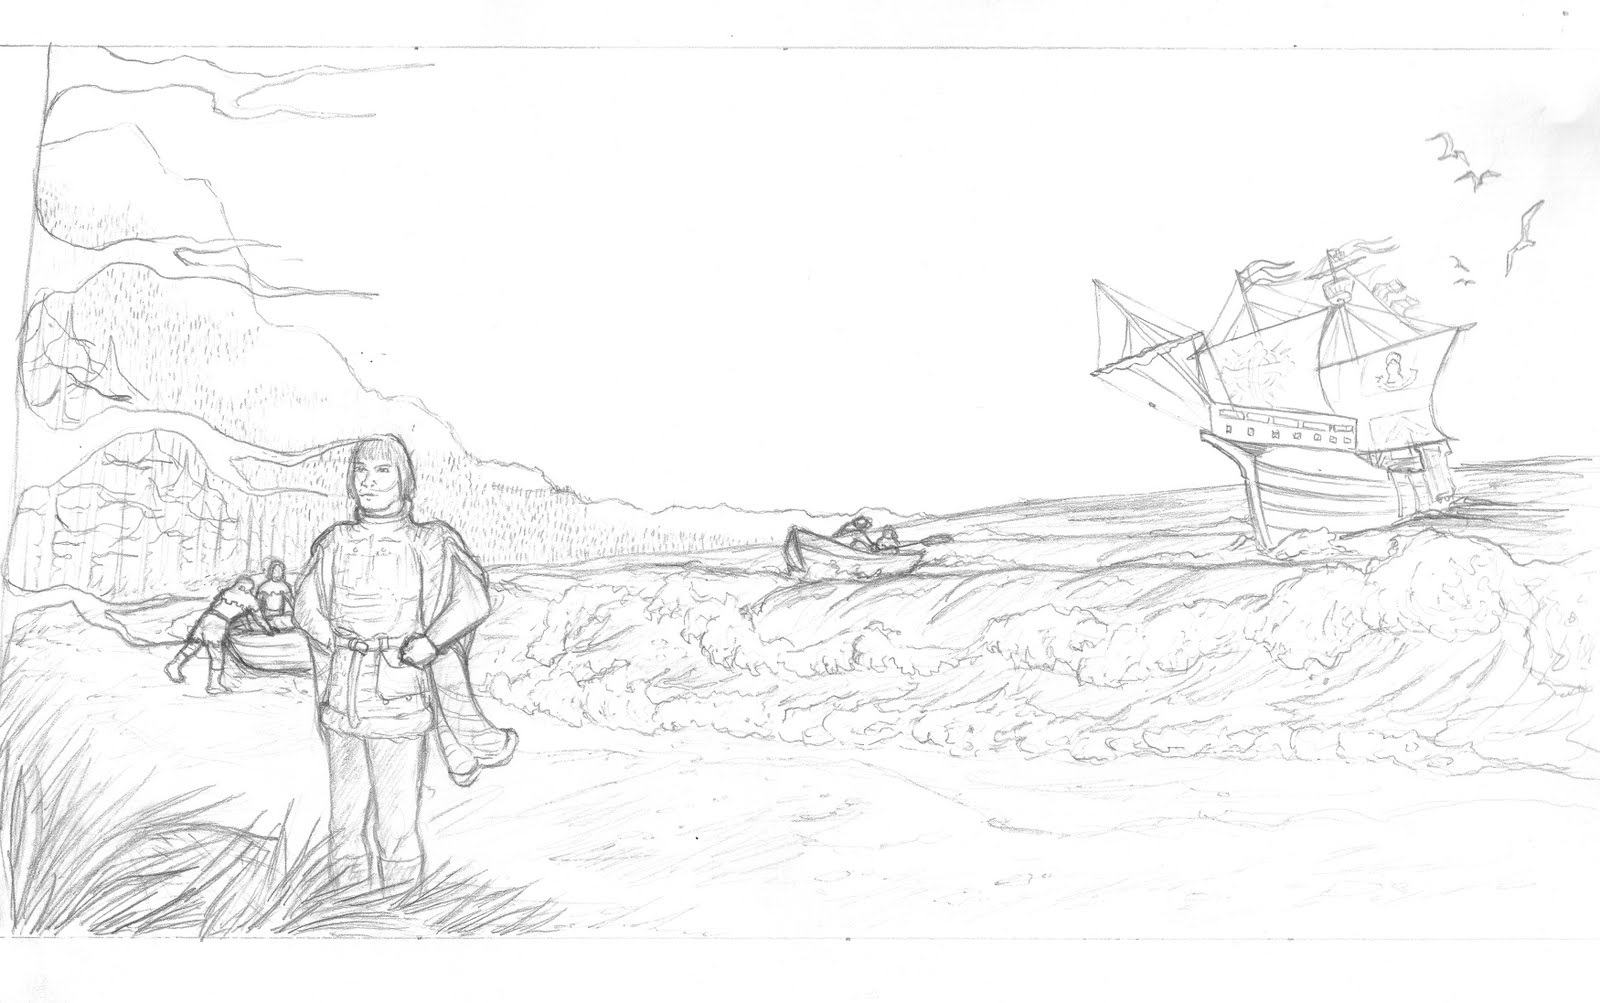 Sara Dunkerton Illustration and Animation: John Cabot's